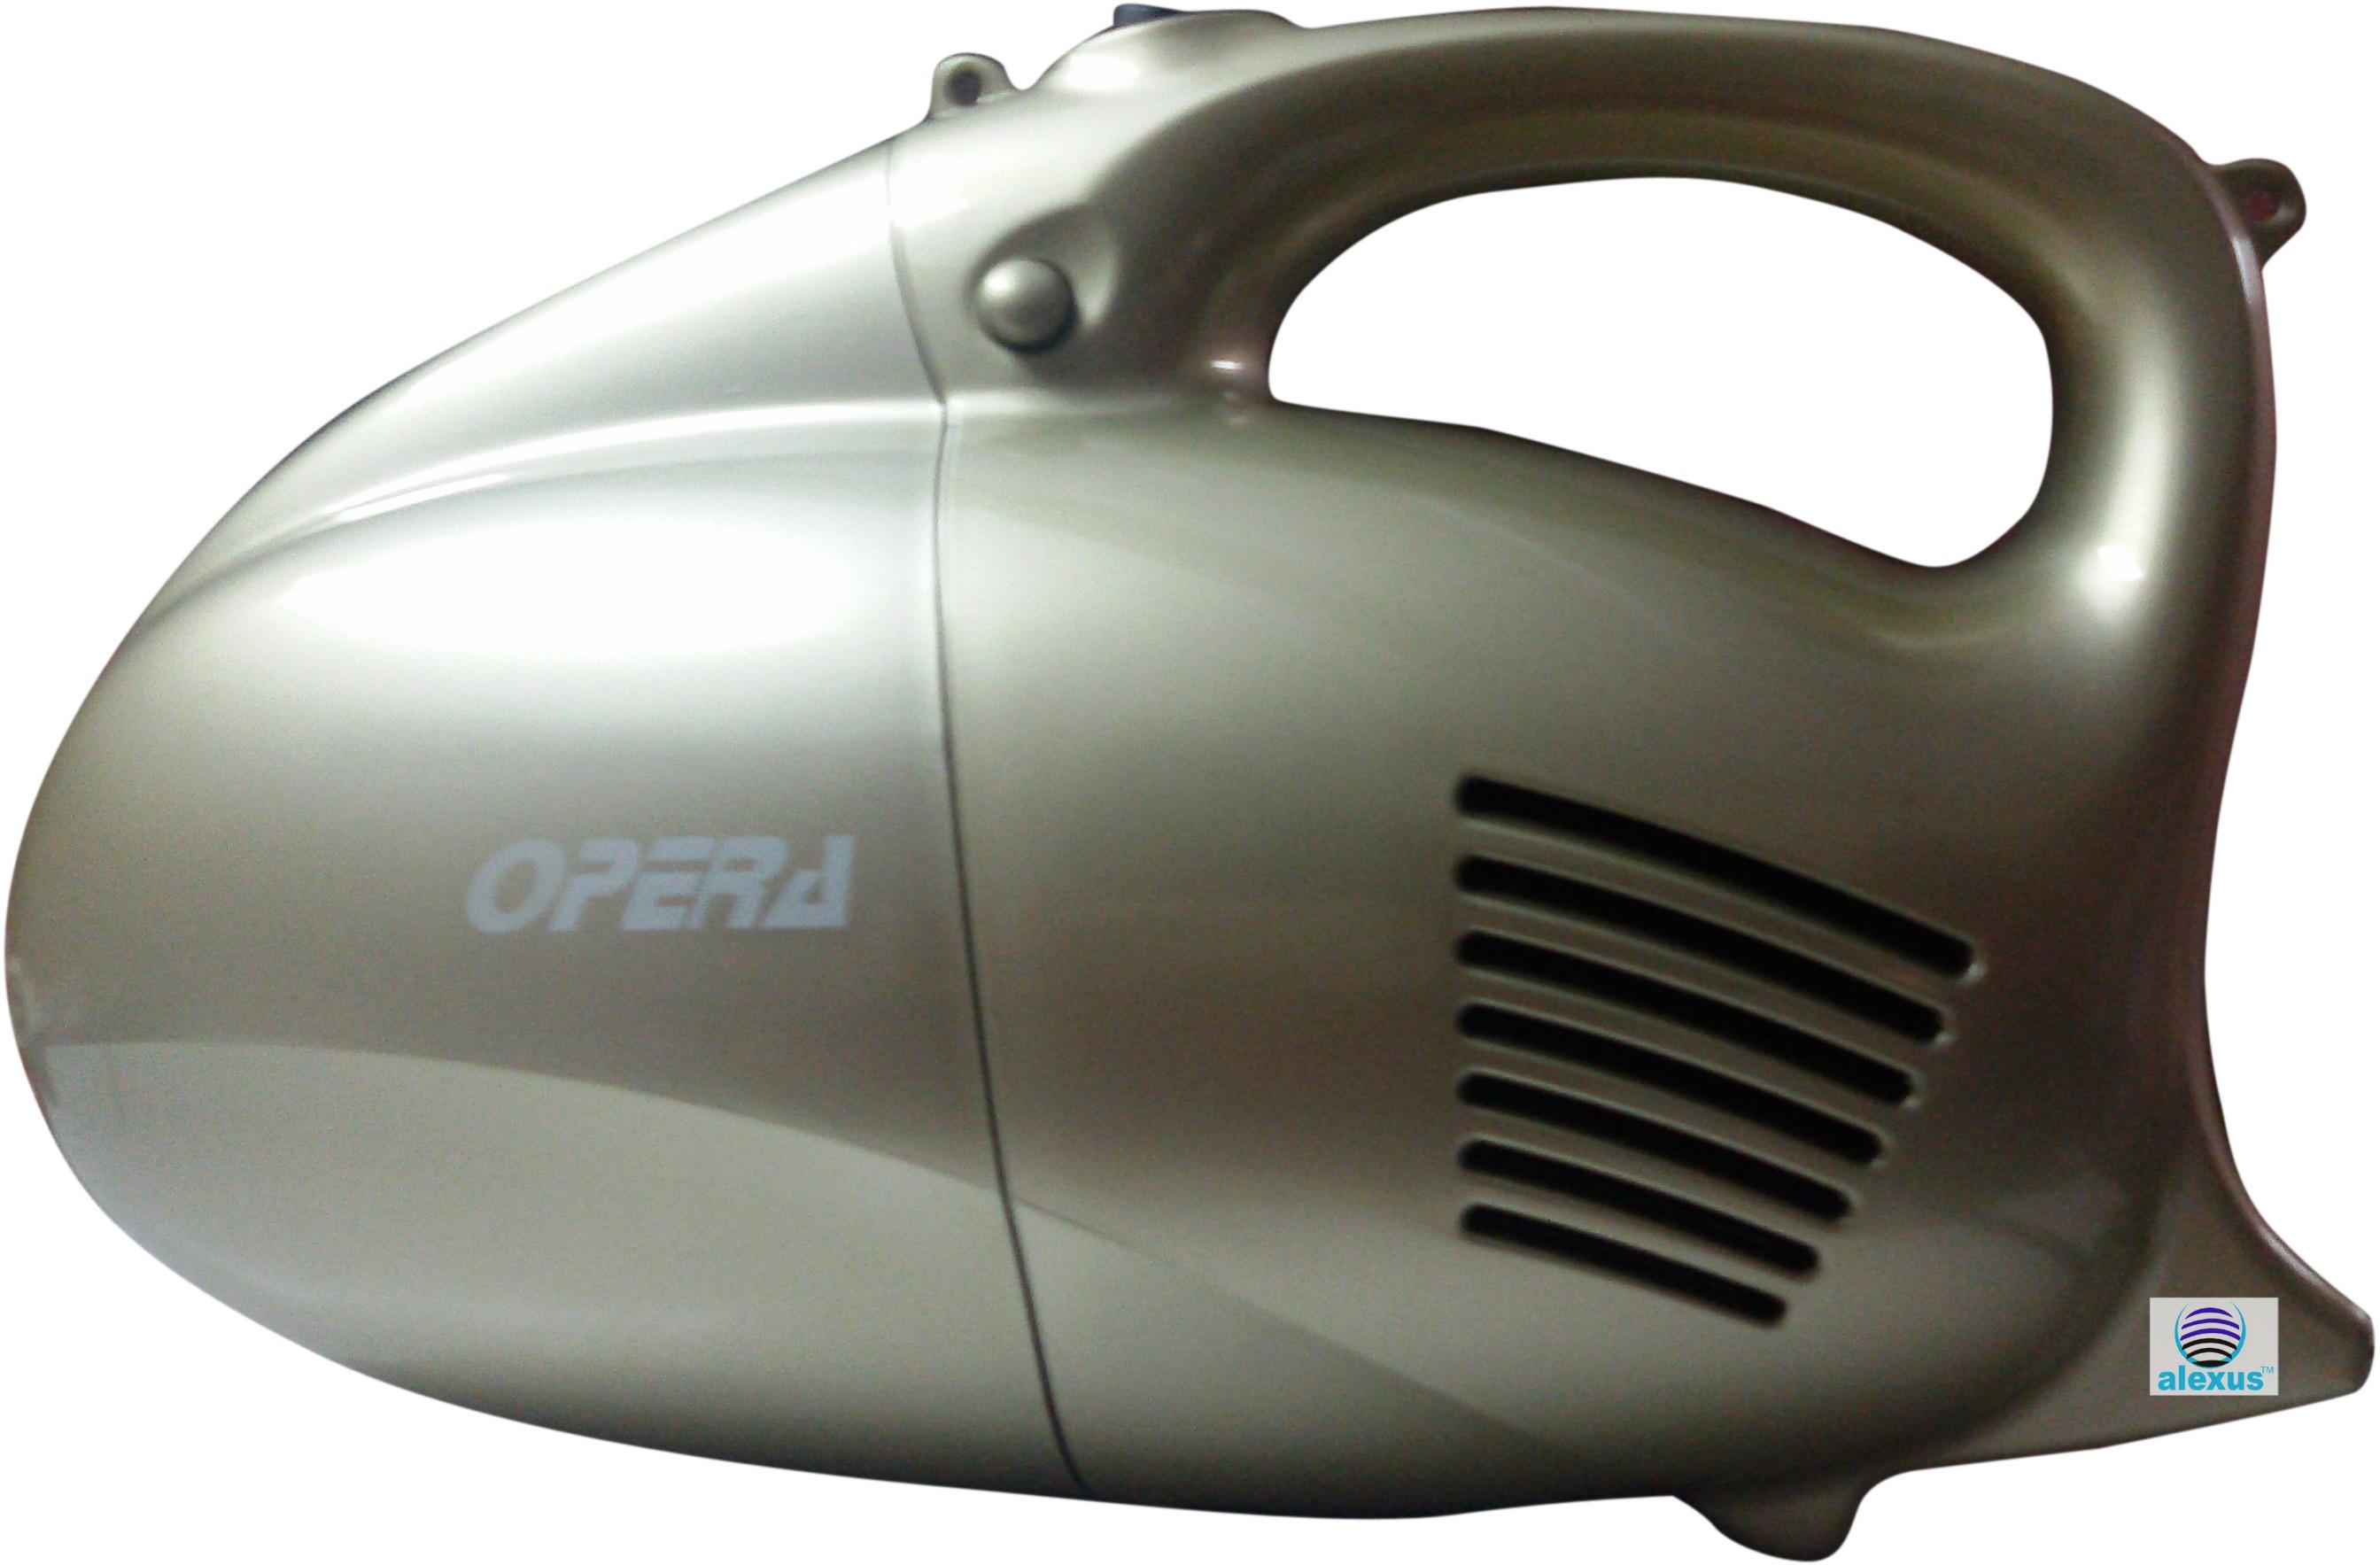 View Alexus Alexus Vacuum Cleaner 800 Hand-held Vacuum Cleaner(Gold) Home Appliances Price Online(Alexus)